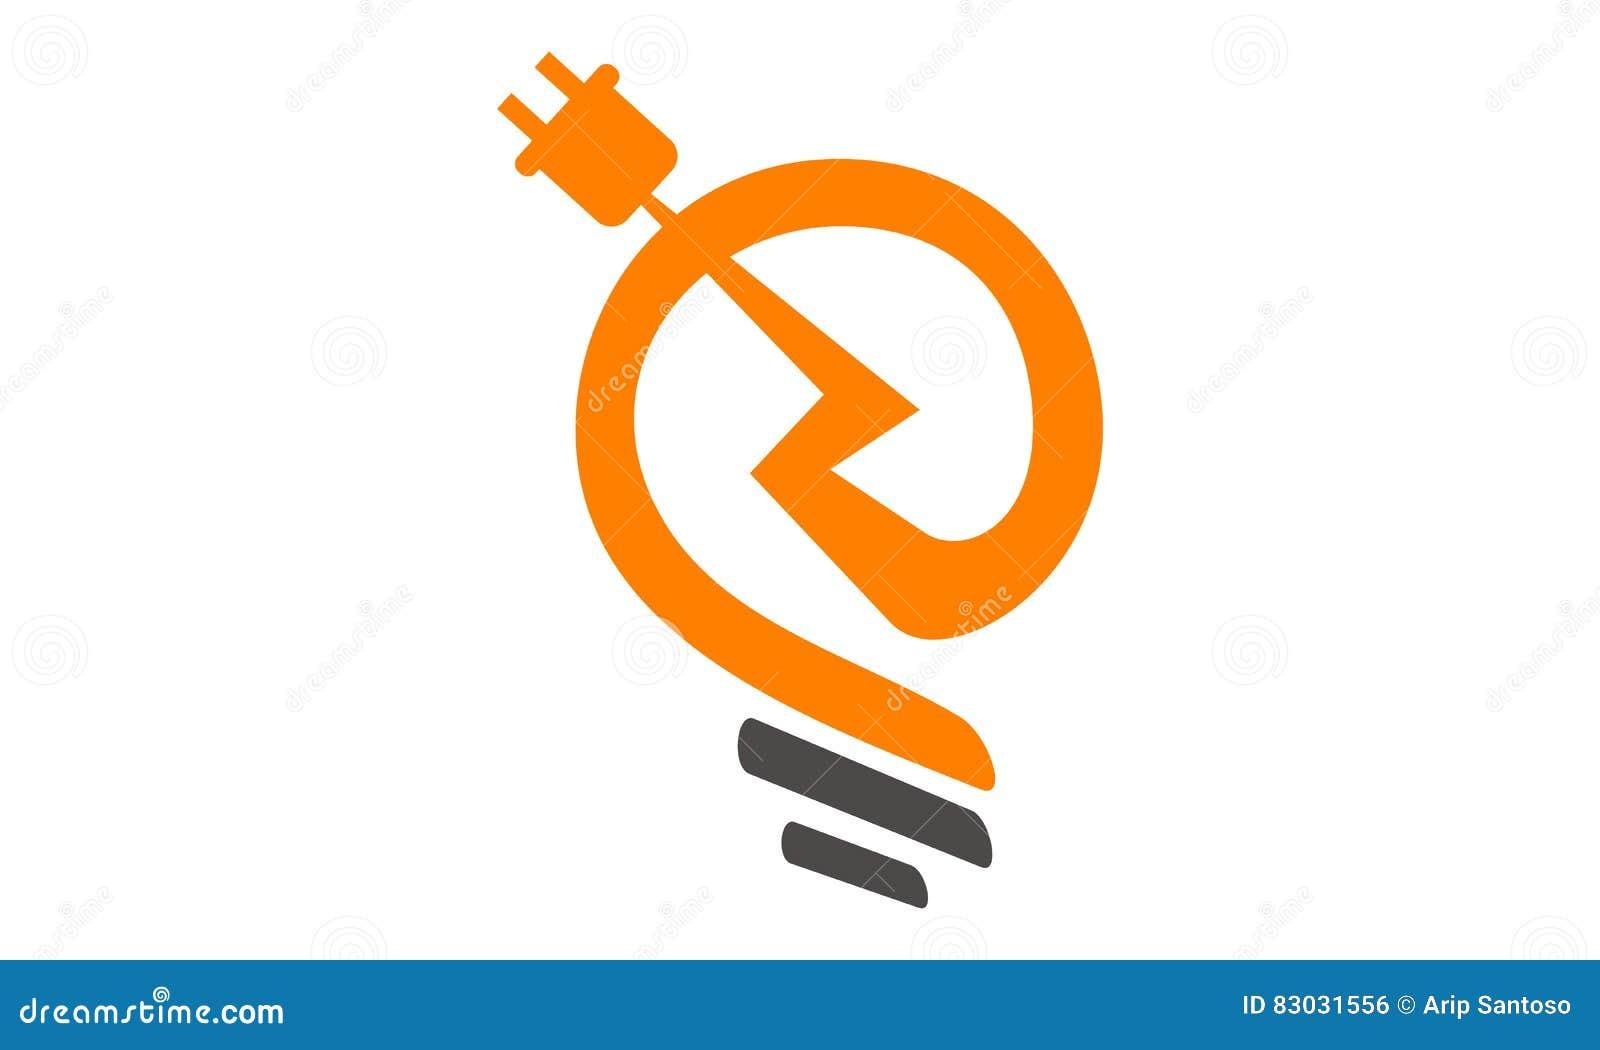 Strom-Logo vektor abbildung. Illustration von blinken - 83031556